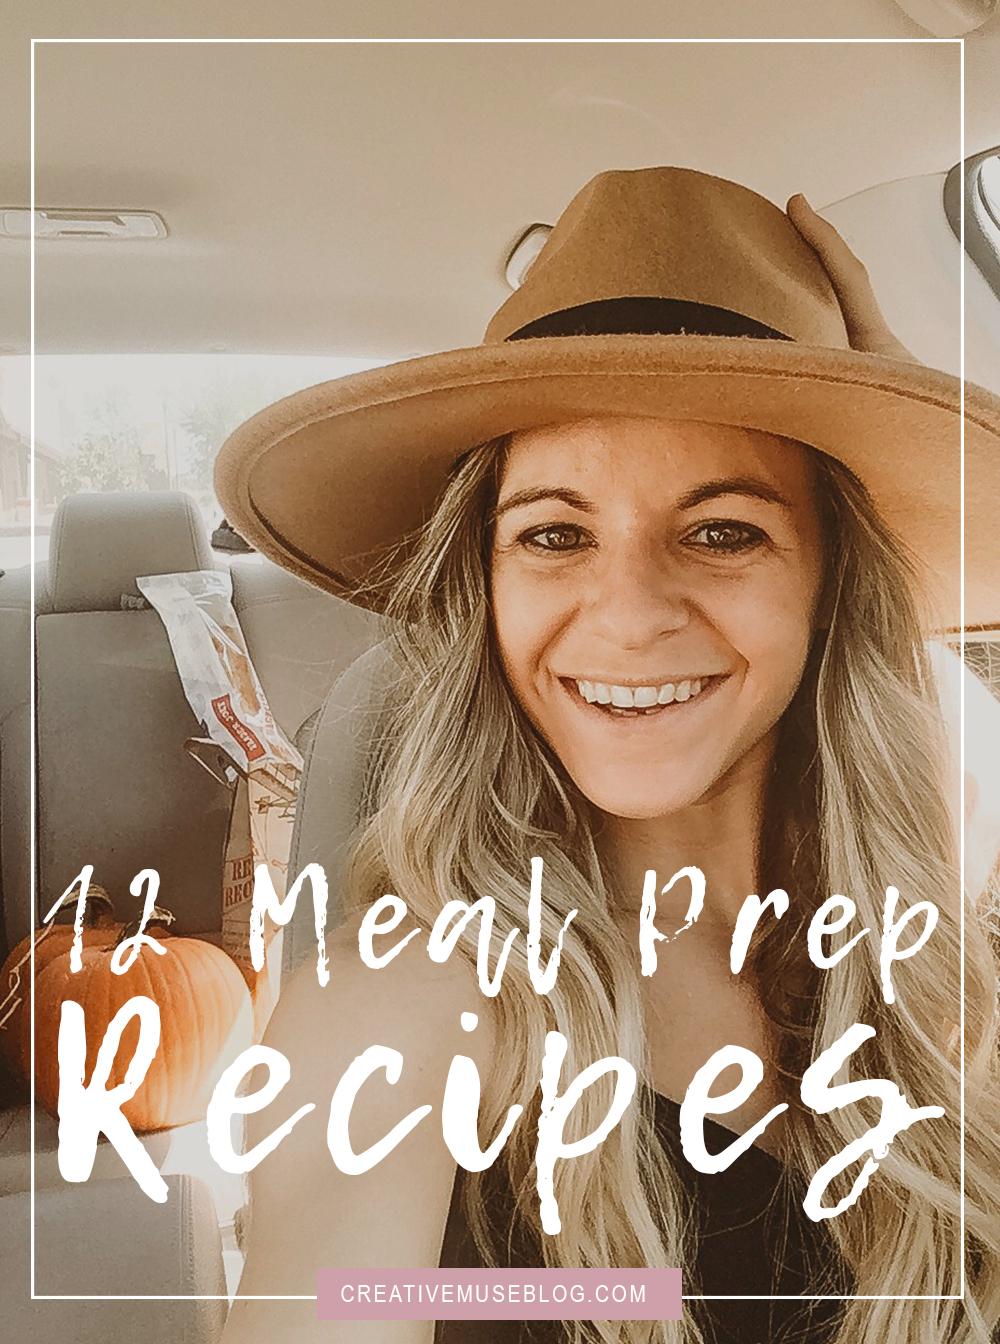 12 Meal Prep Recipes | New Wife Blog | Easy Recipes | Fall Meal Prep Recipes | Christian Girl Blog